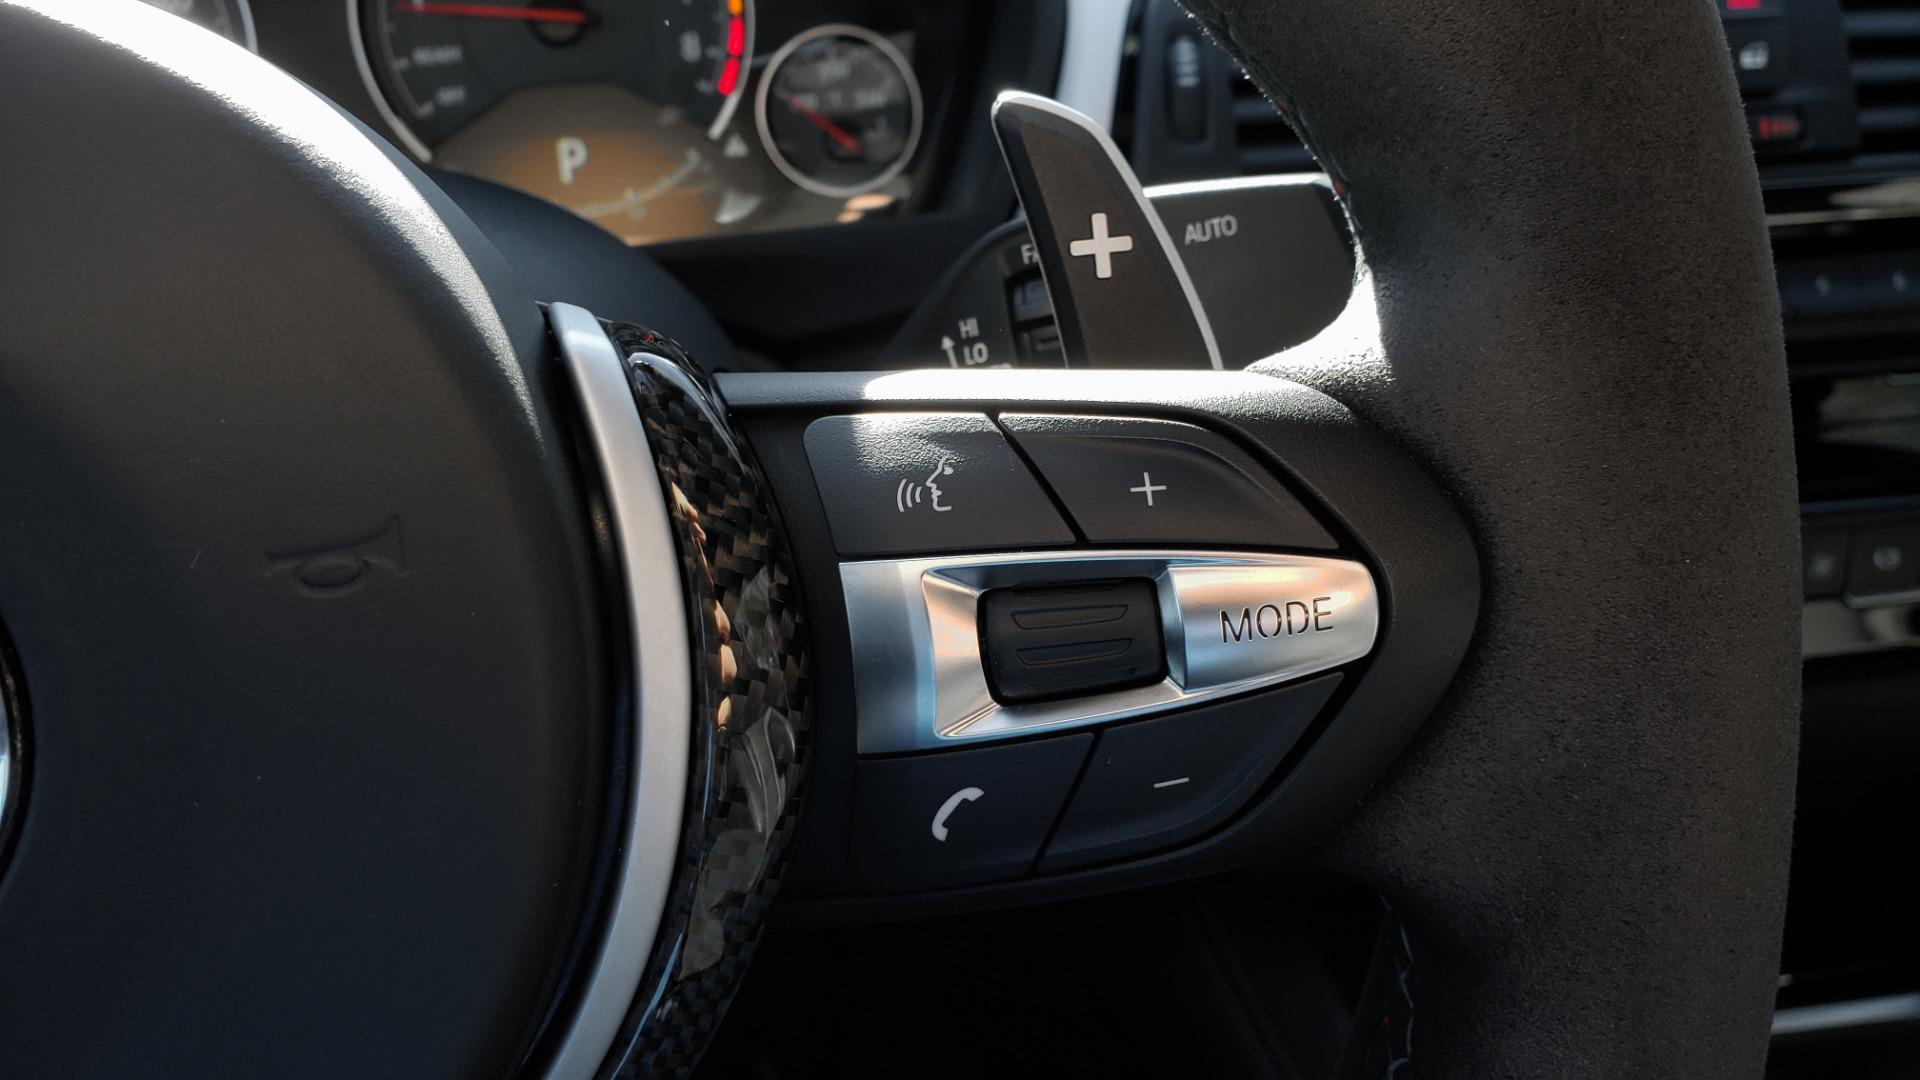 Used 2018 BMW M4 COMP PKG / EXEC / M-DRIVER / PARK CNTRL / ACTIVE BLIND SPOT for sale Sold at Formula Imports in Charlotte NC 28227 44